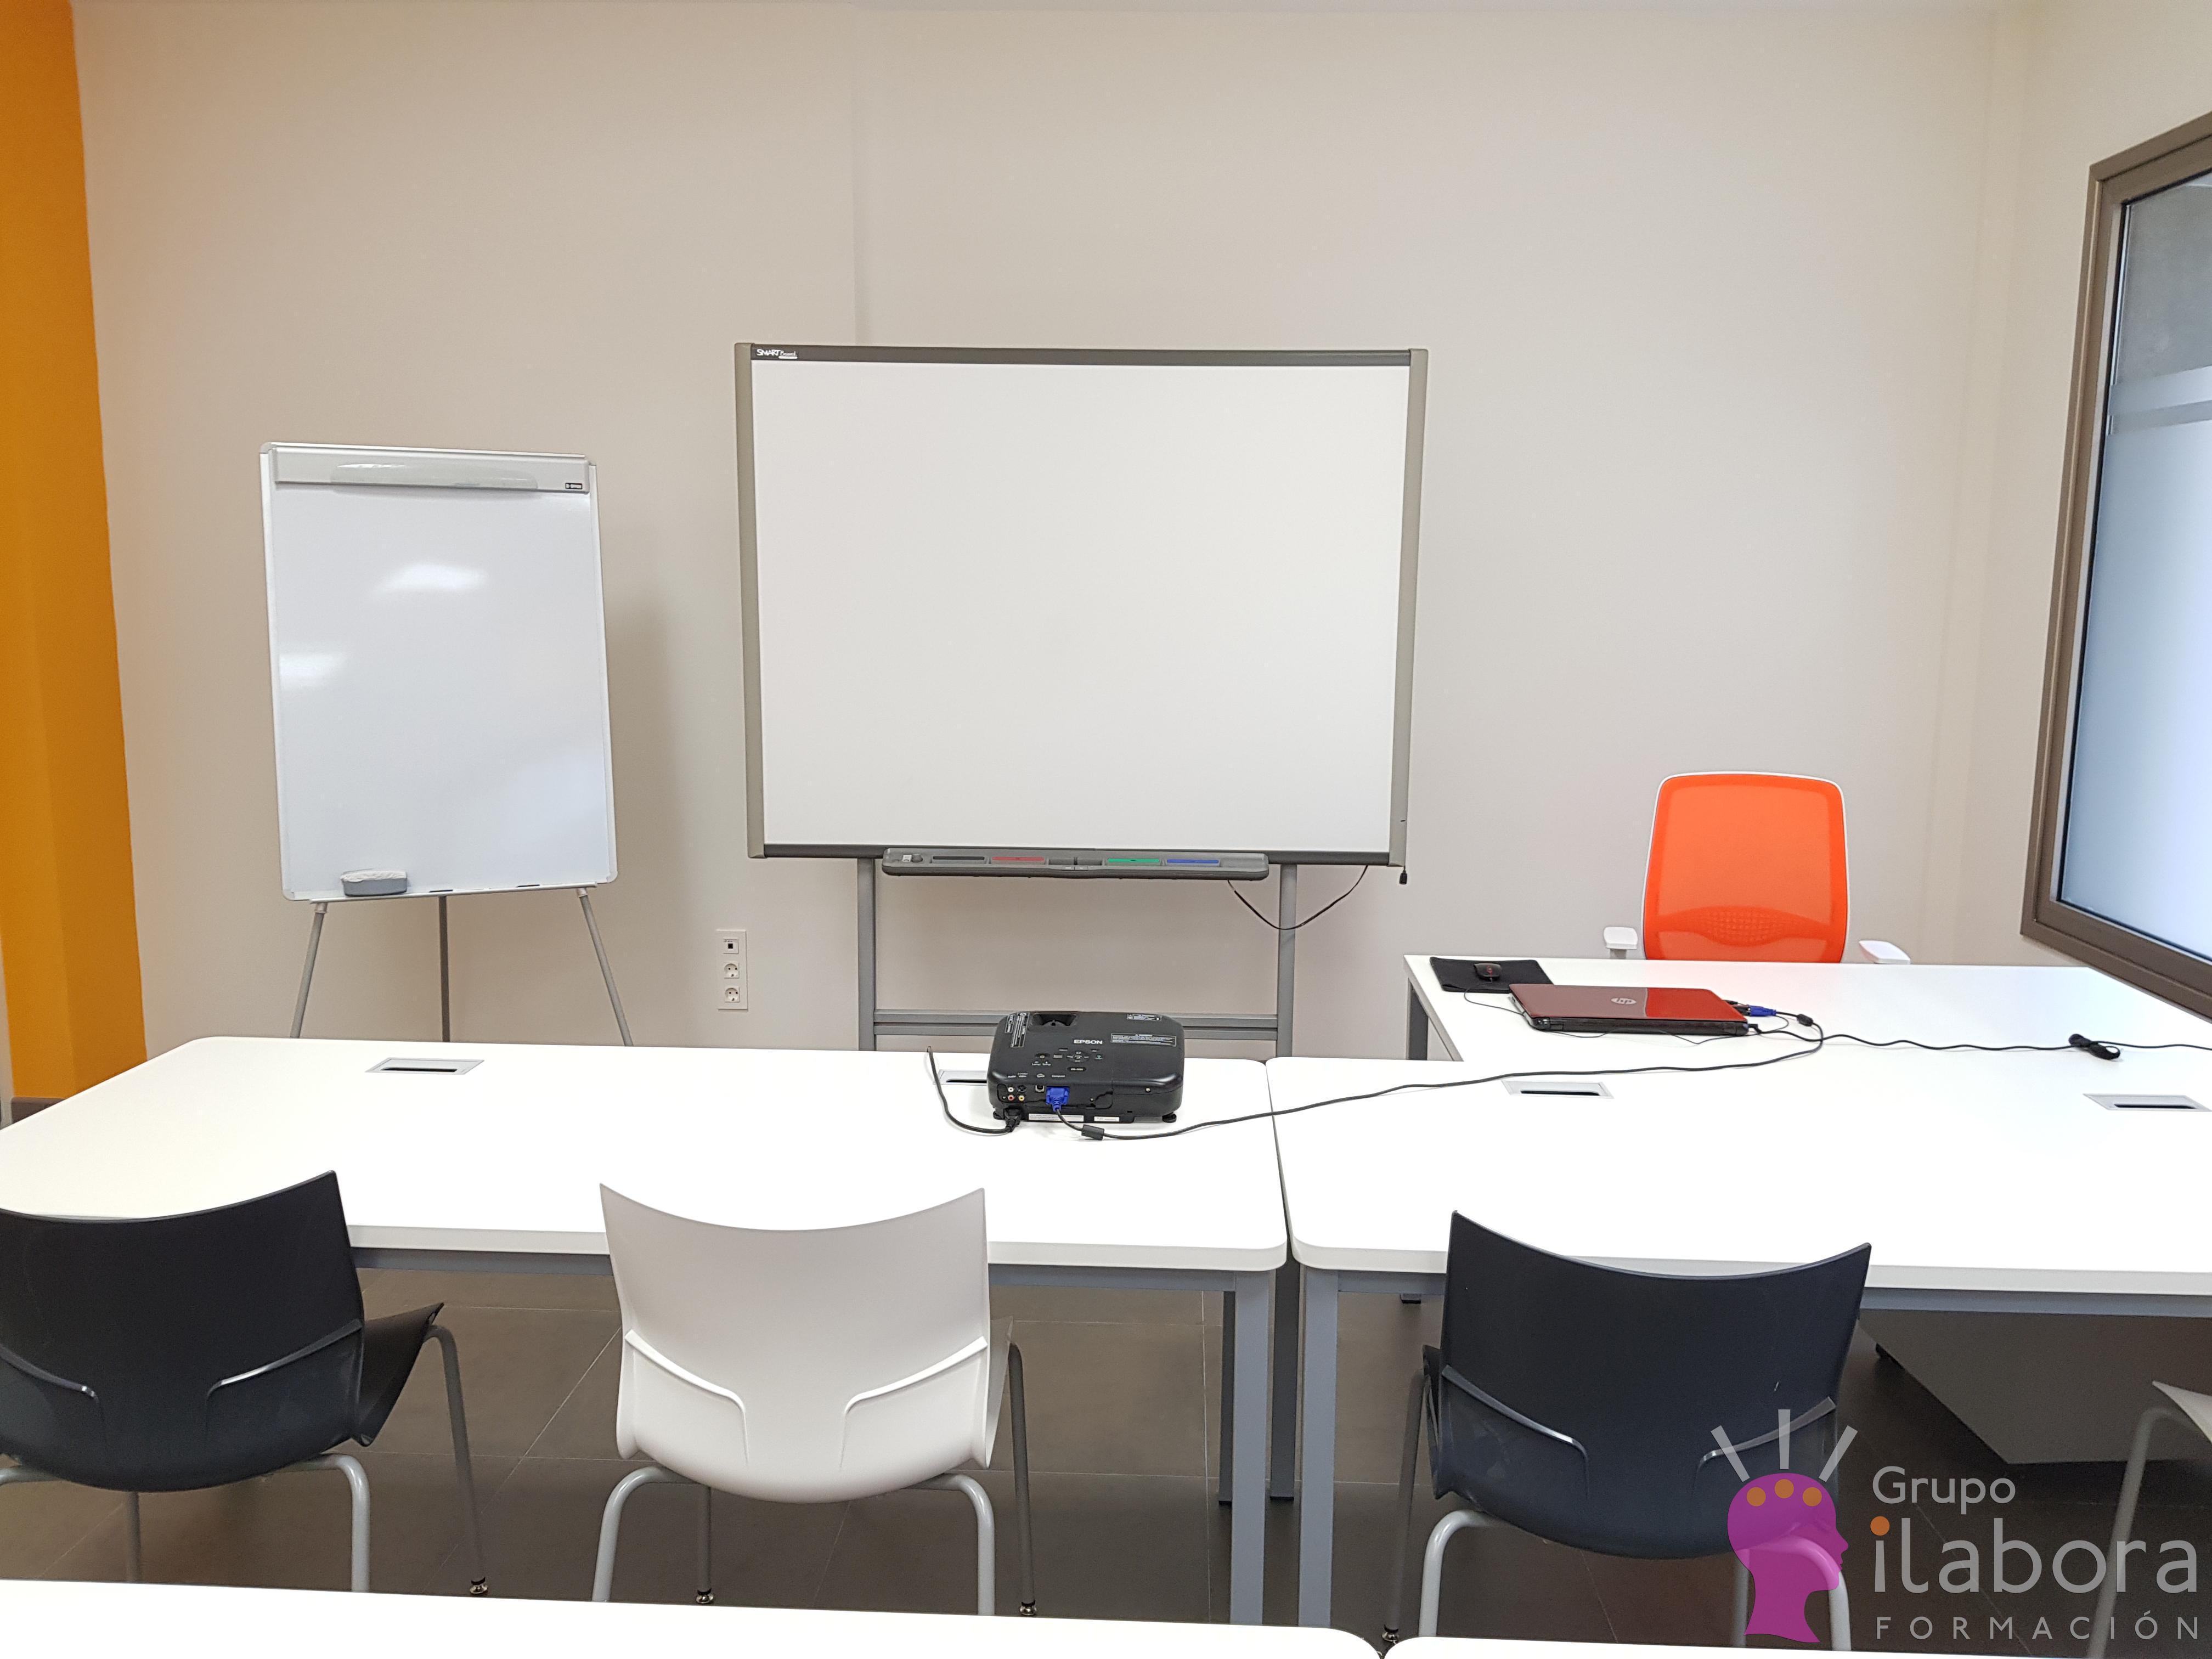 Alquiler de aulas de formación en Gijón (Asturias)